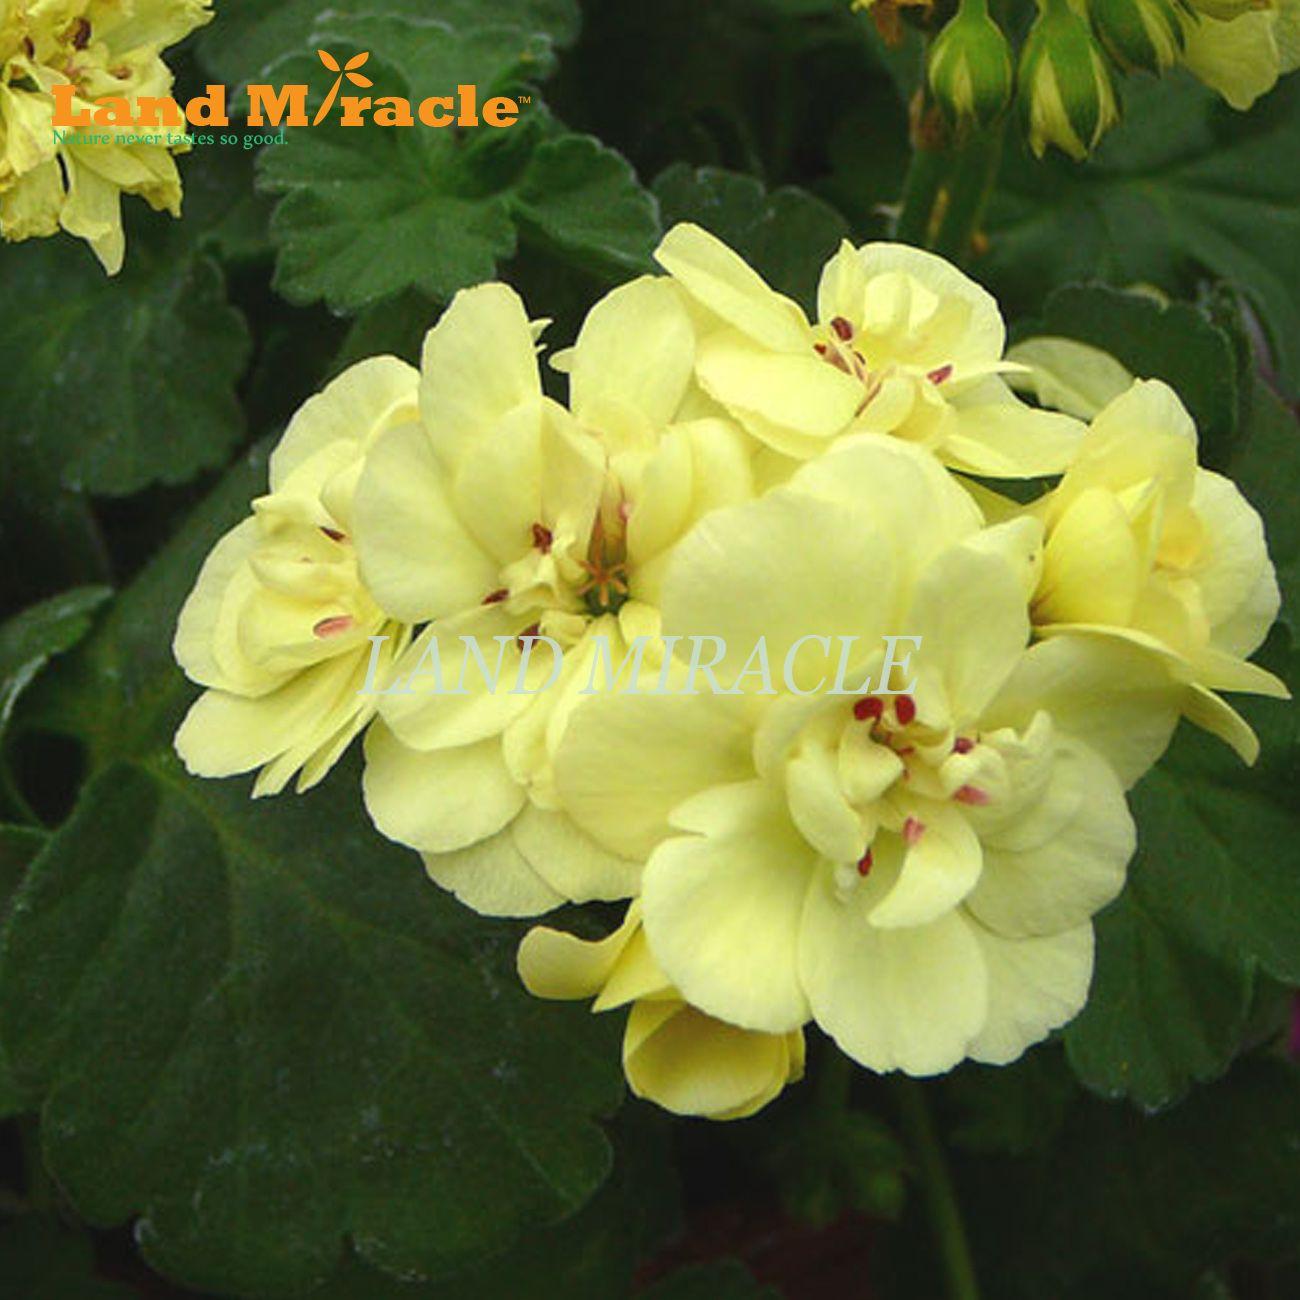 Rare Geranium Seeds, 5 Seeds, Yellow Pelargonium Perennial Potted Plant indoor / outdoor Garden Flowers